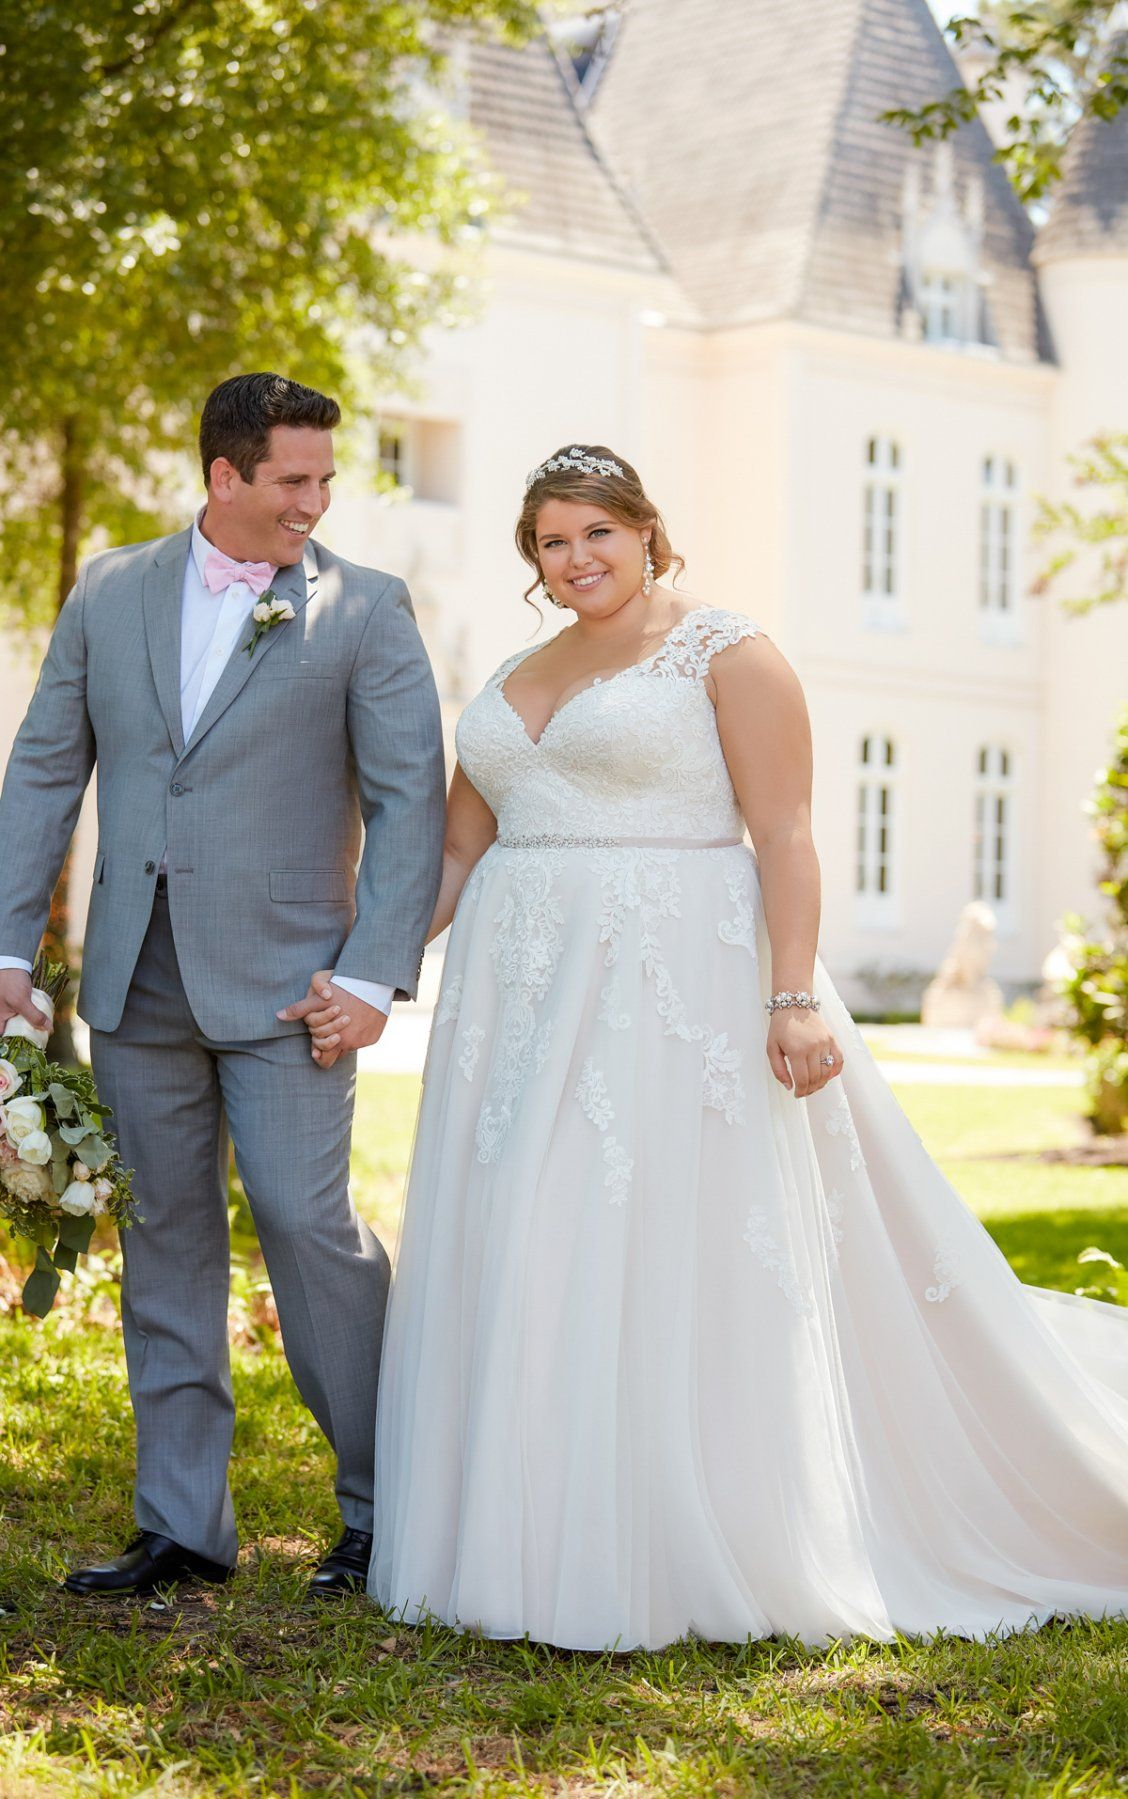 42++ Wedding dresses for short fat brides ideas in 2021